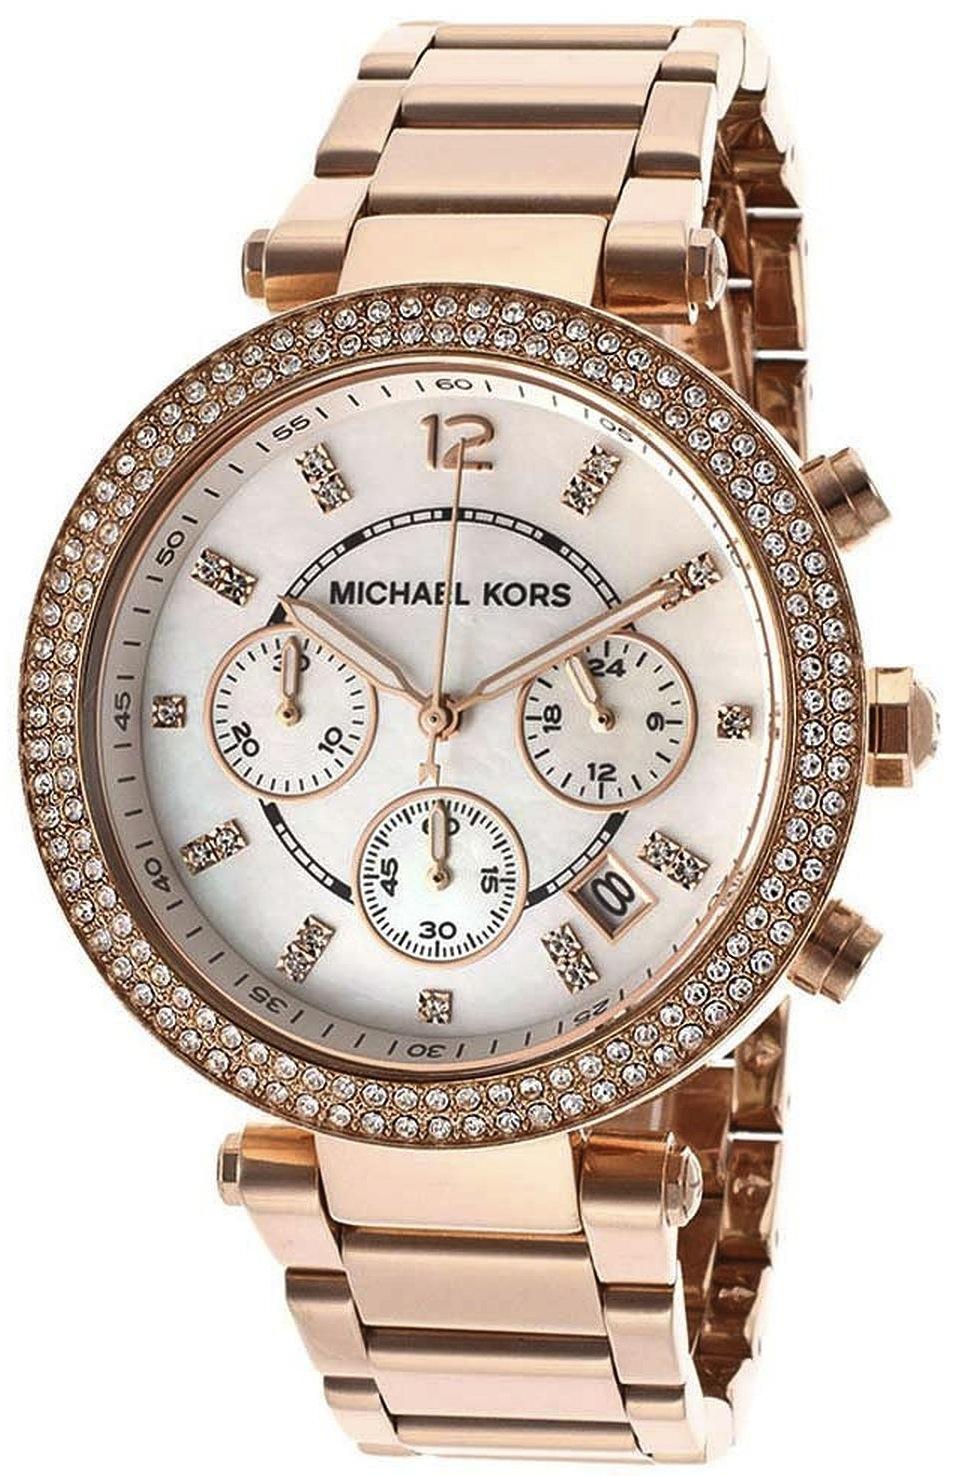 Cadou de Craciun Ceas de dama Michael Kors MK5491